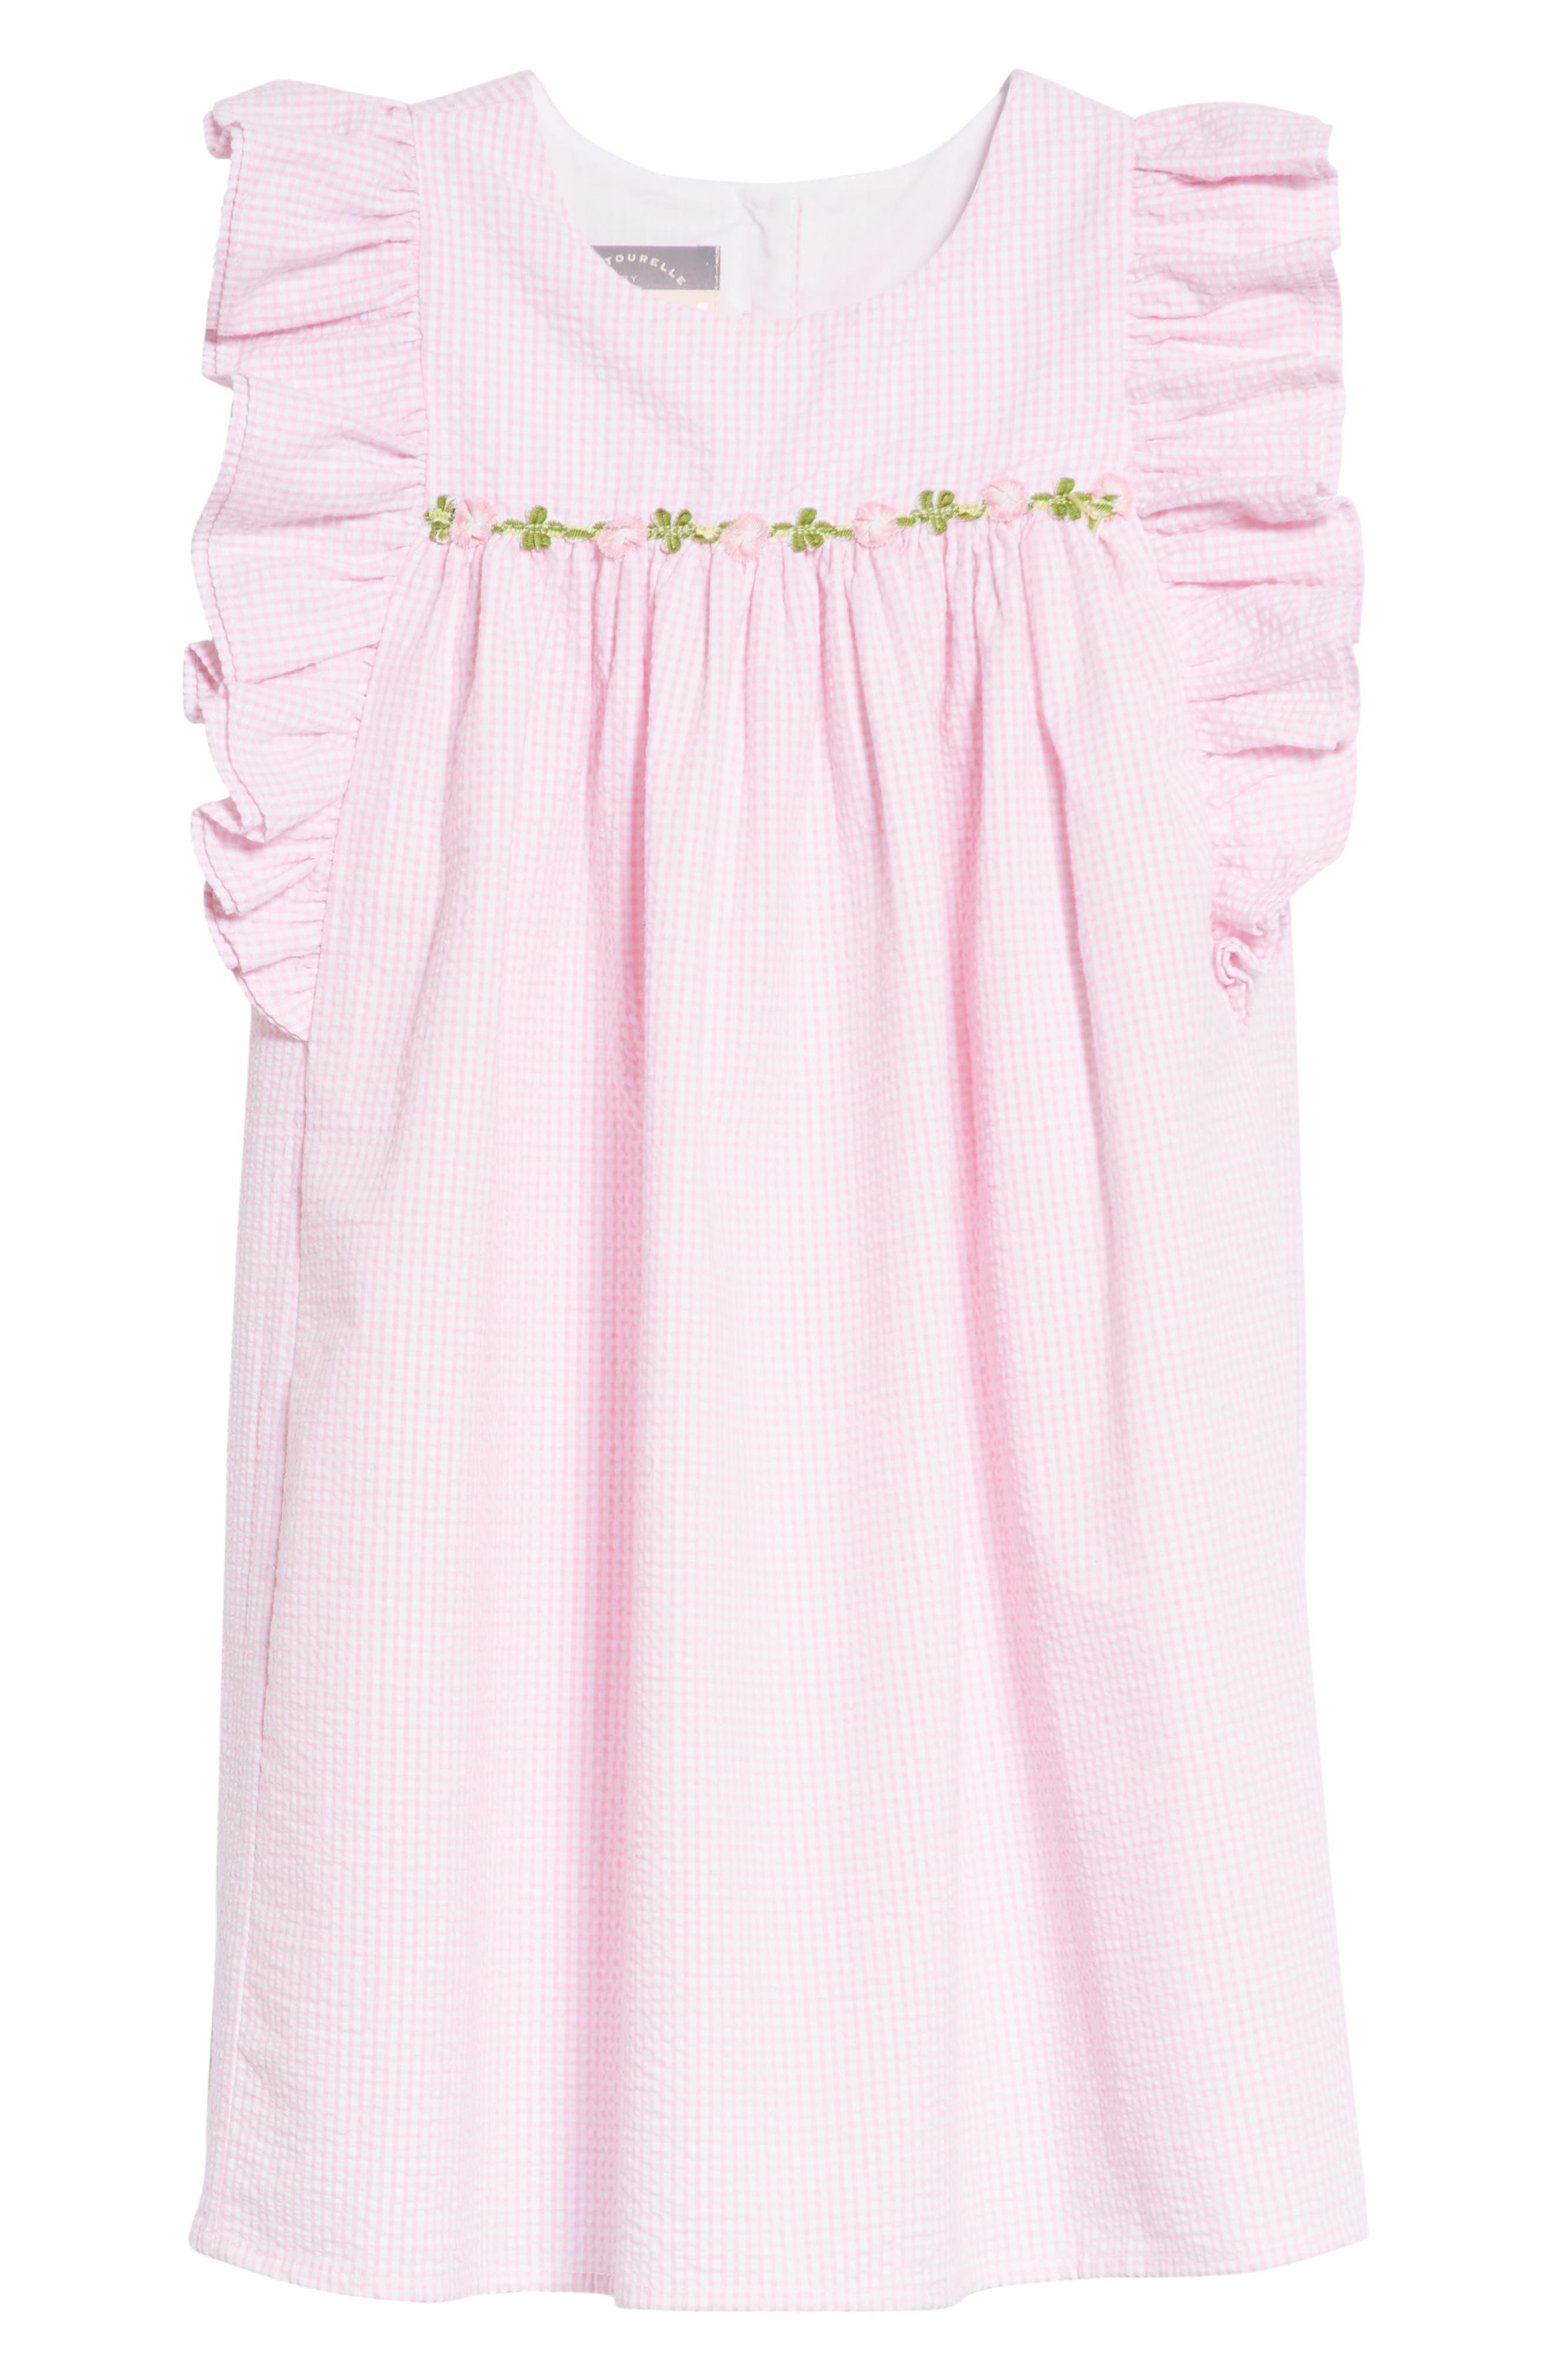 Seersucker Ruffle Sleeve Dress,                         Main,                         color, Pink/ White